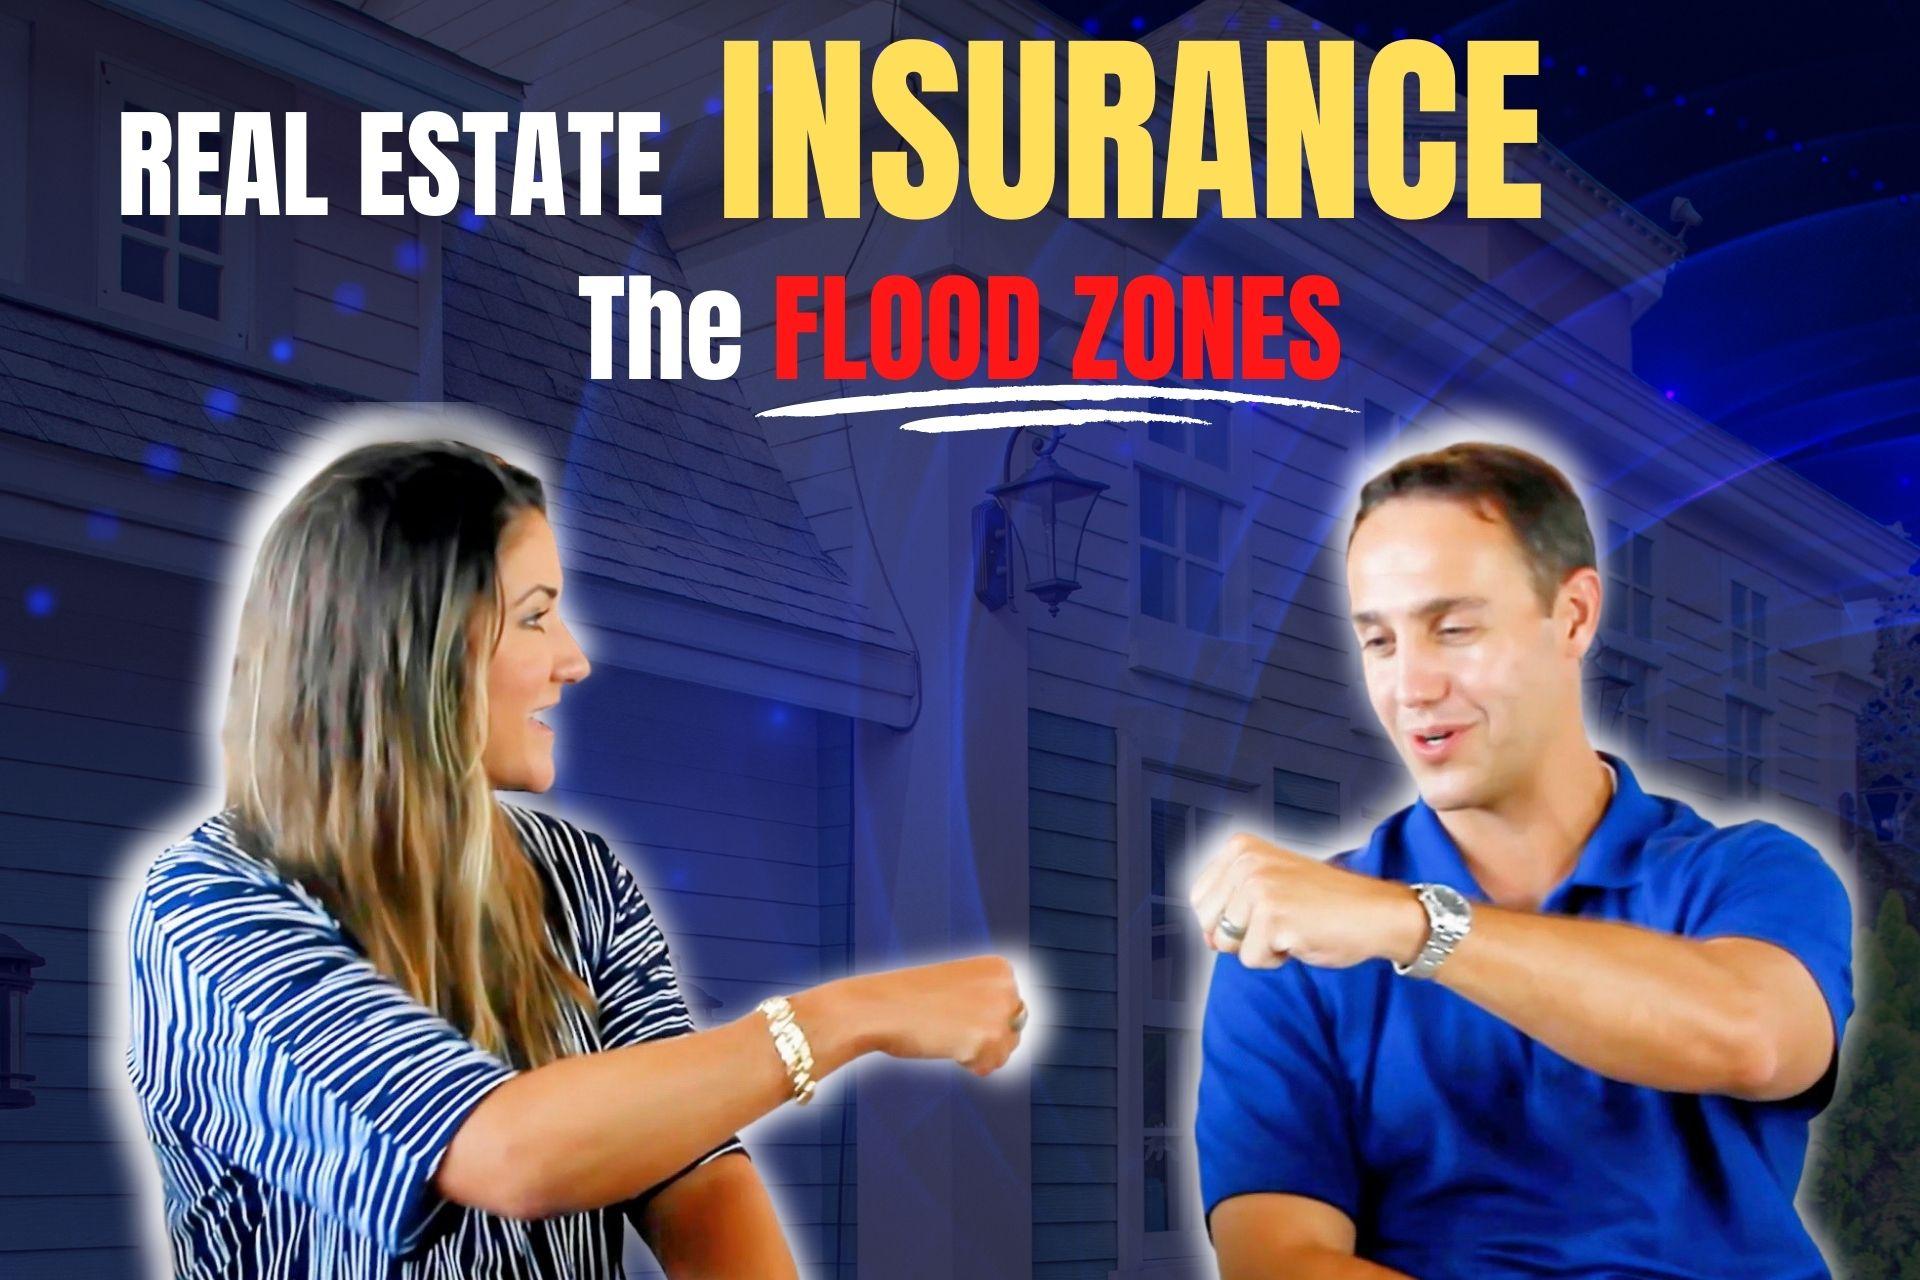 Flood Zones Insurance - Interview with Kara Herring